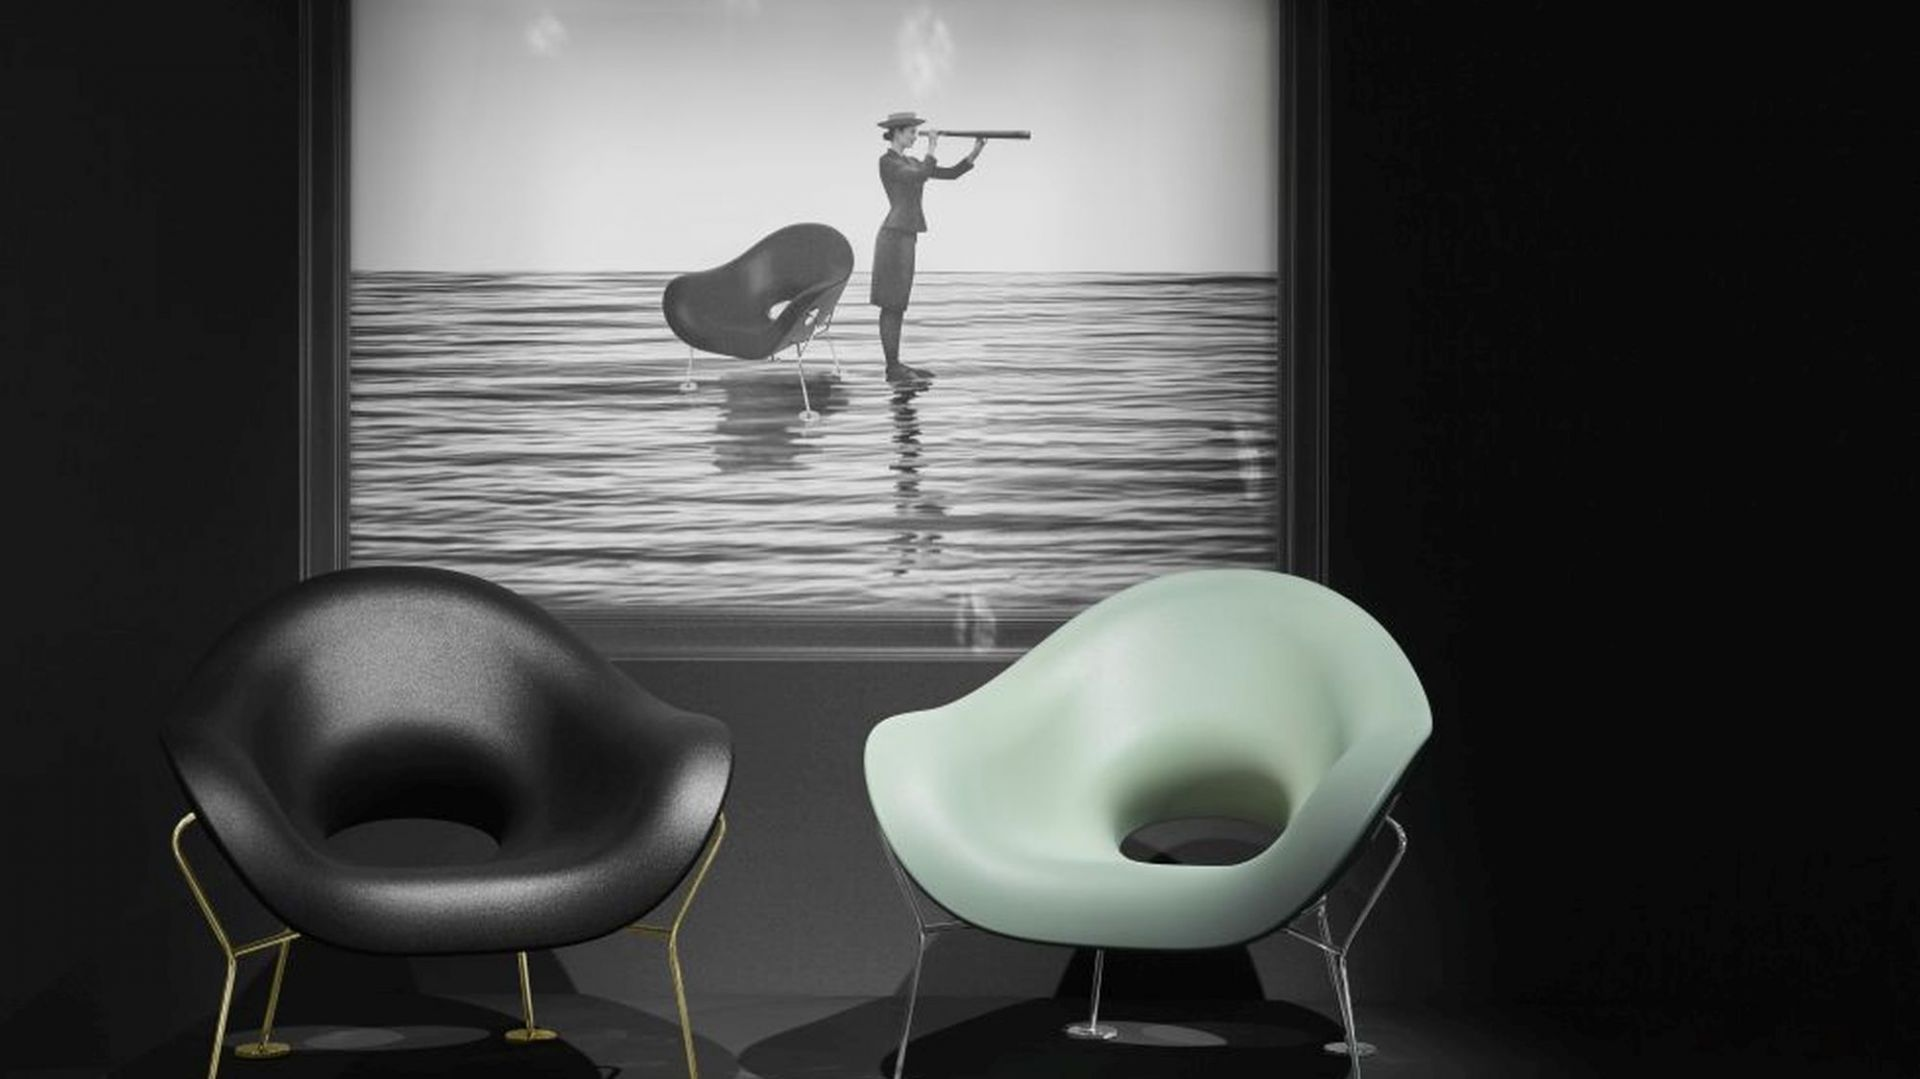 Fotel Pupa zaprojektowany przez Andrea Branzi/Qeeboo. Fot. BM Housing